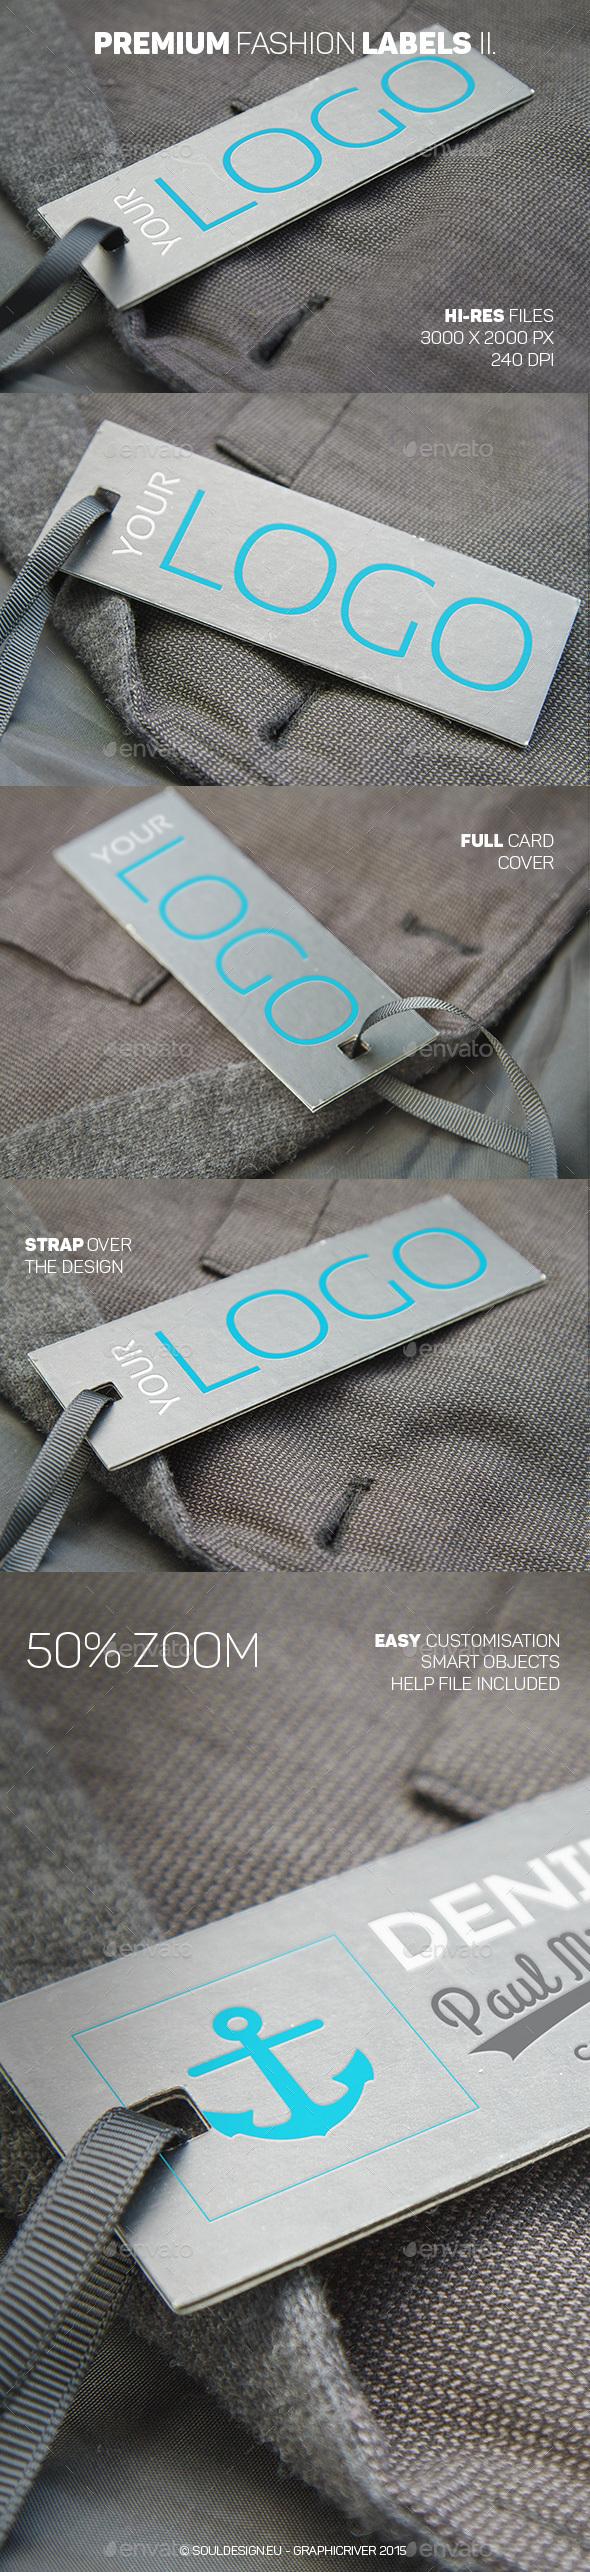 Premium Fashion Labels Mockup II - Logo Product Mock-Ups